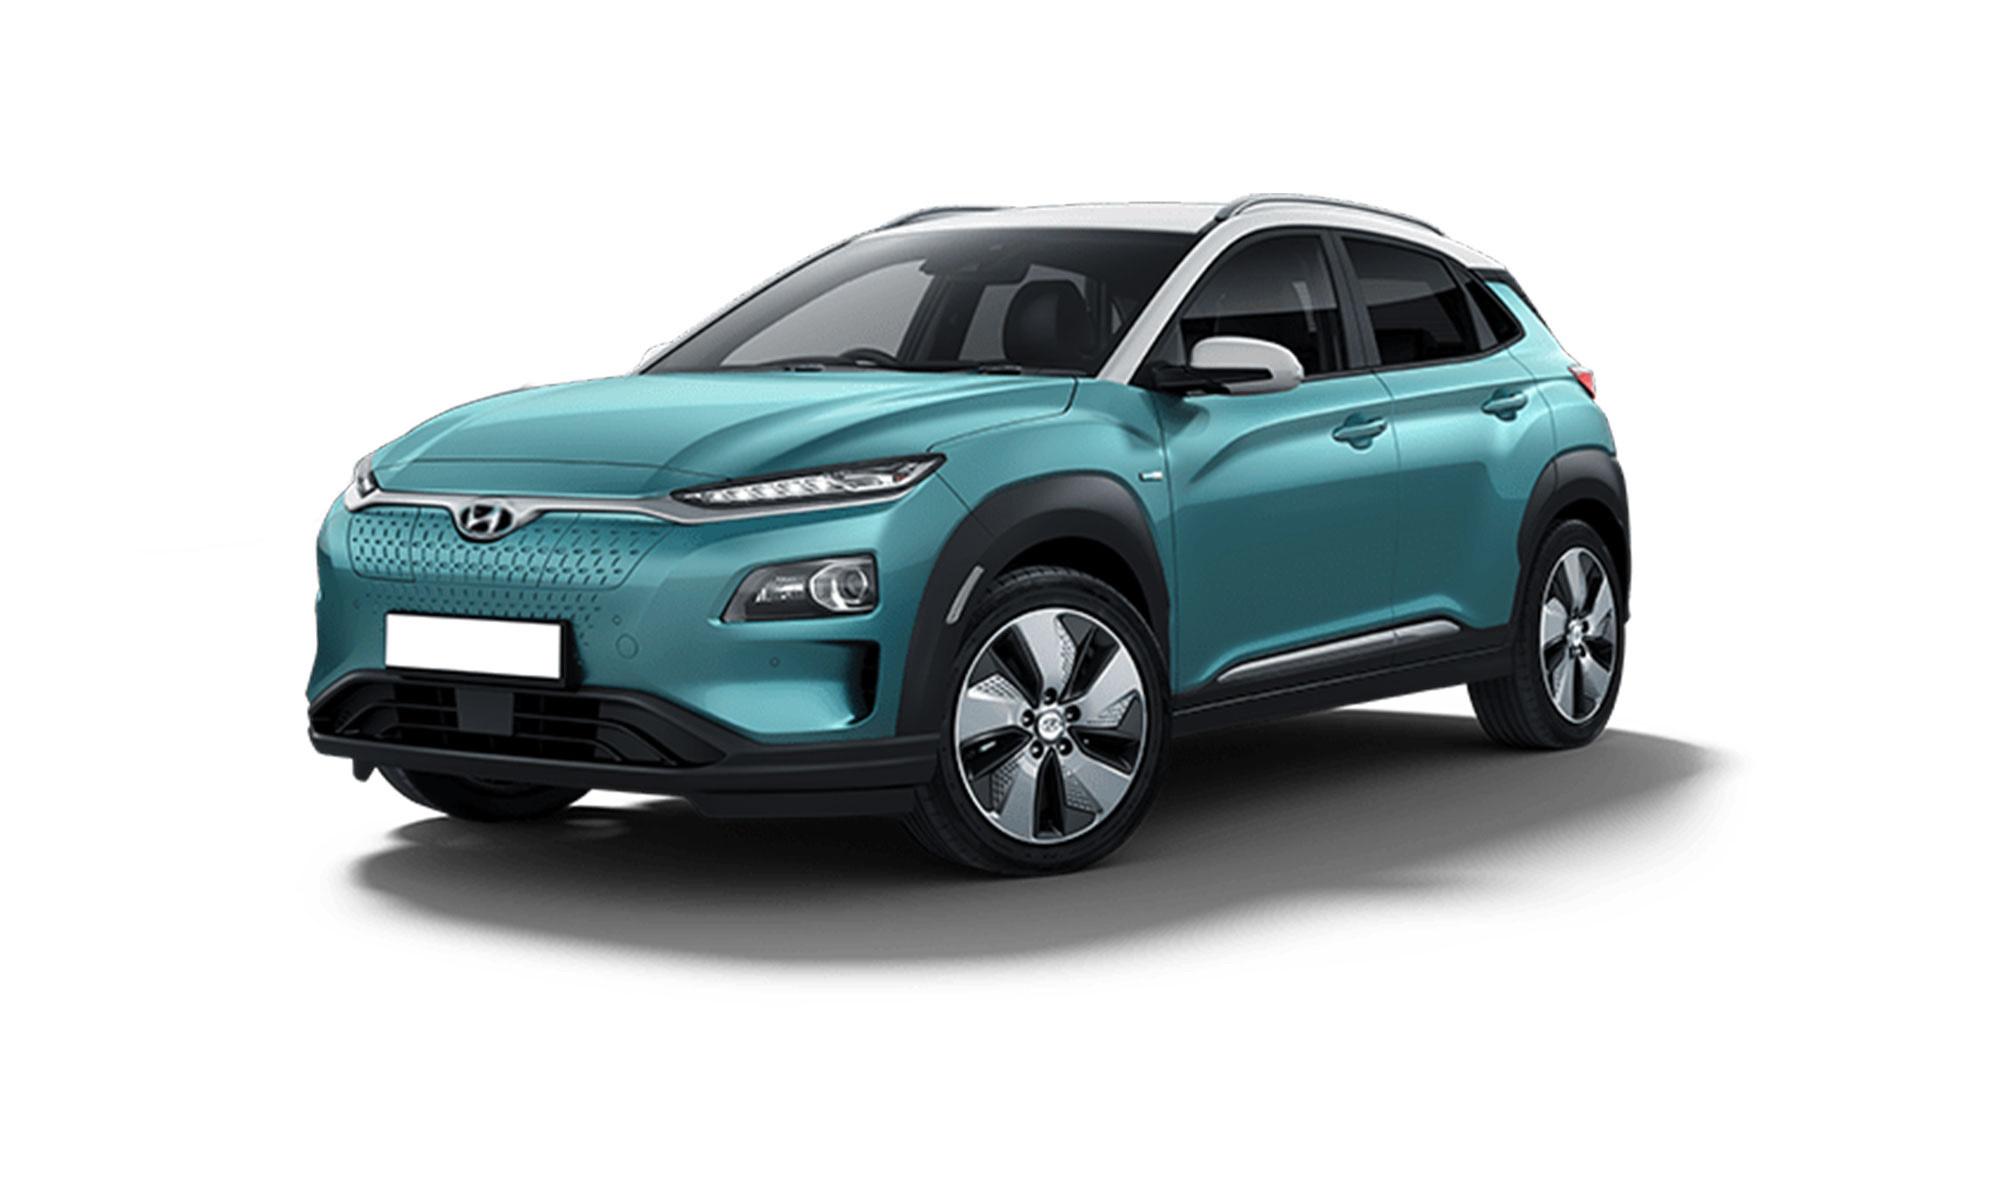 Hyundai KONA Electric 39 kWh (2018)